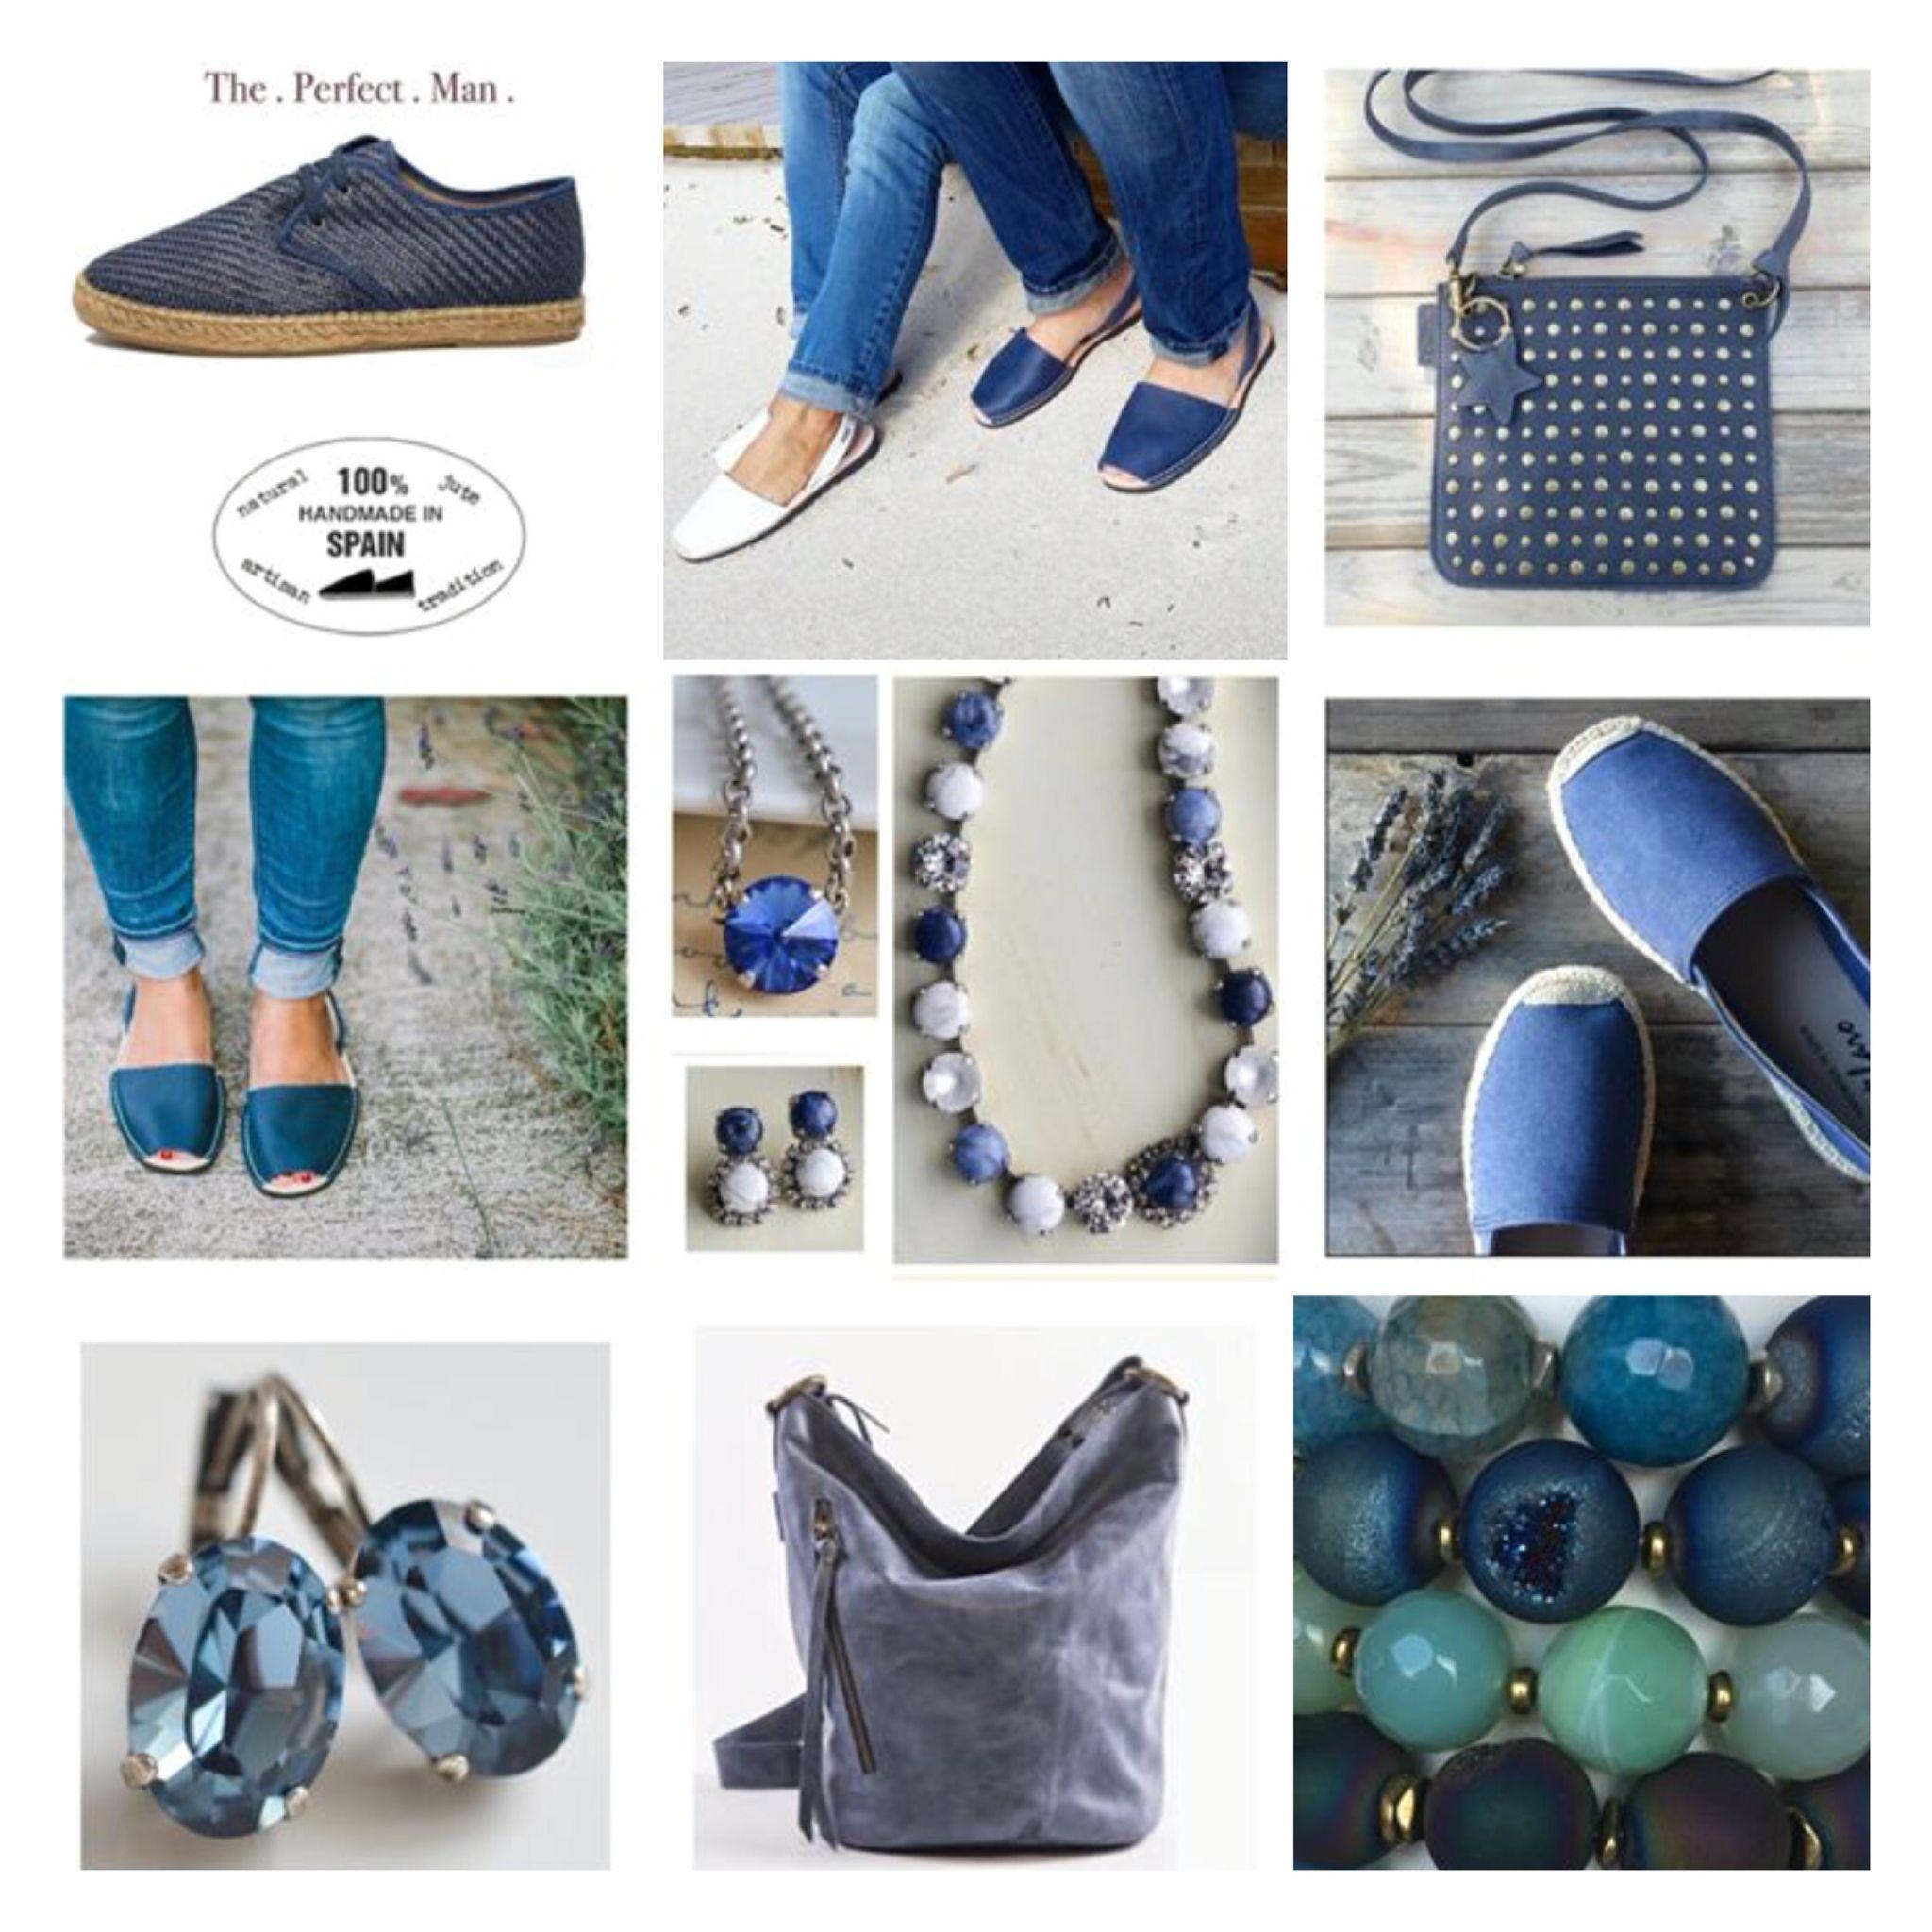 #Blues #Stylemax Jan.24-26, SS2016! @rmdjewelry @avarcasusa @EspadrillesUSA @Chen&Derington @Skiss.me